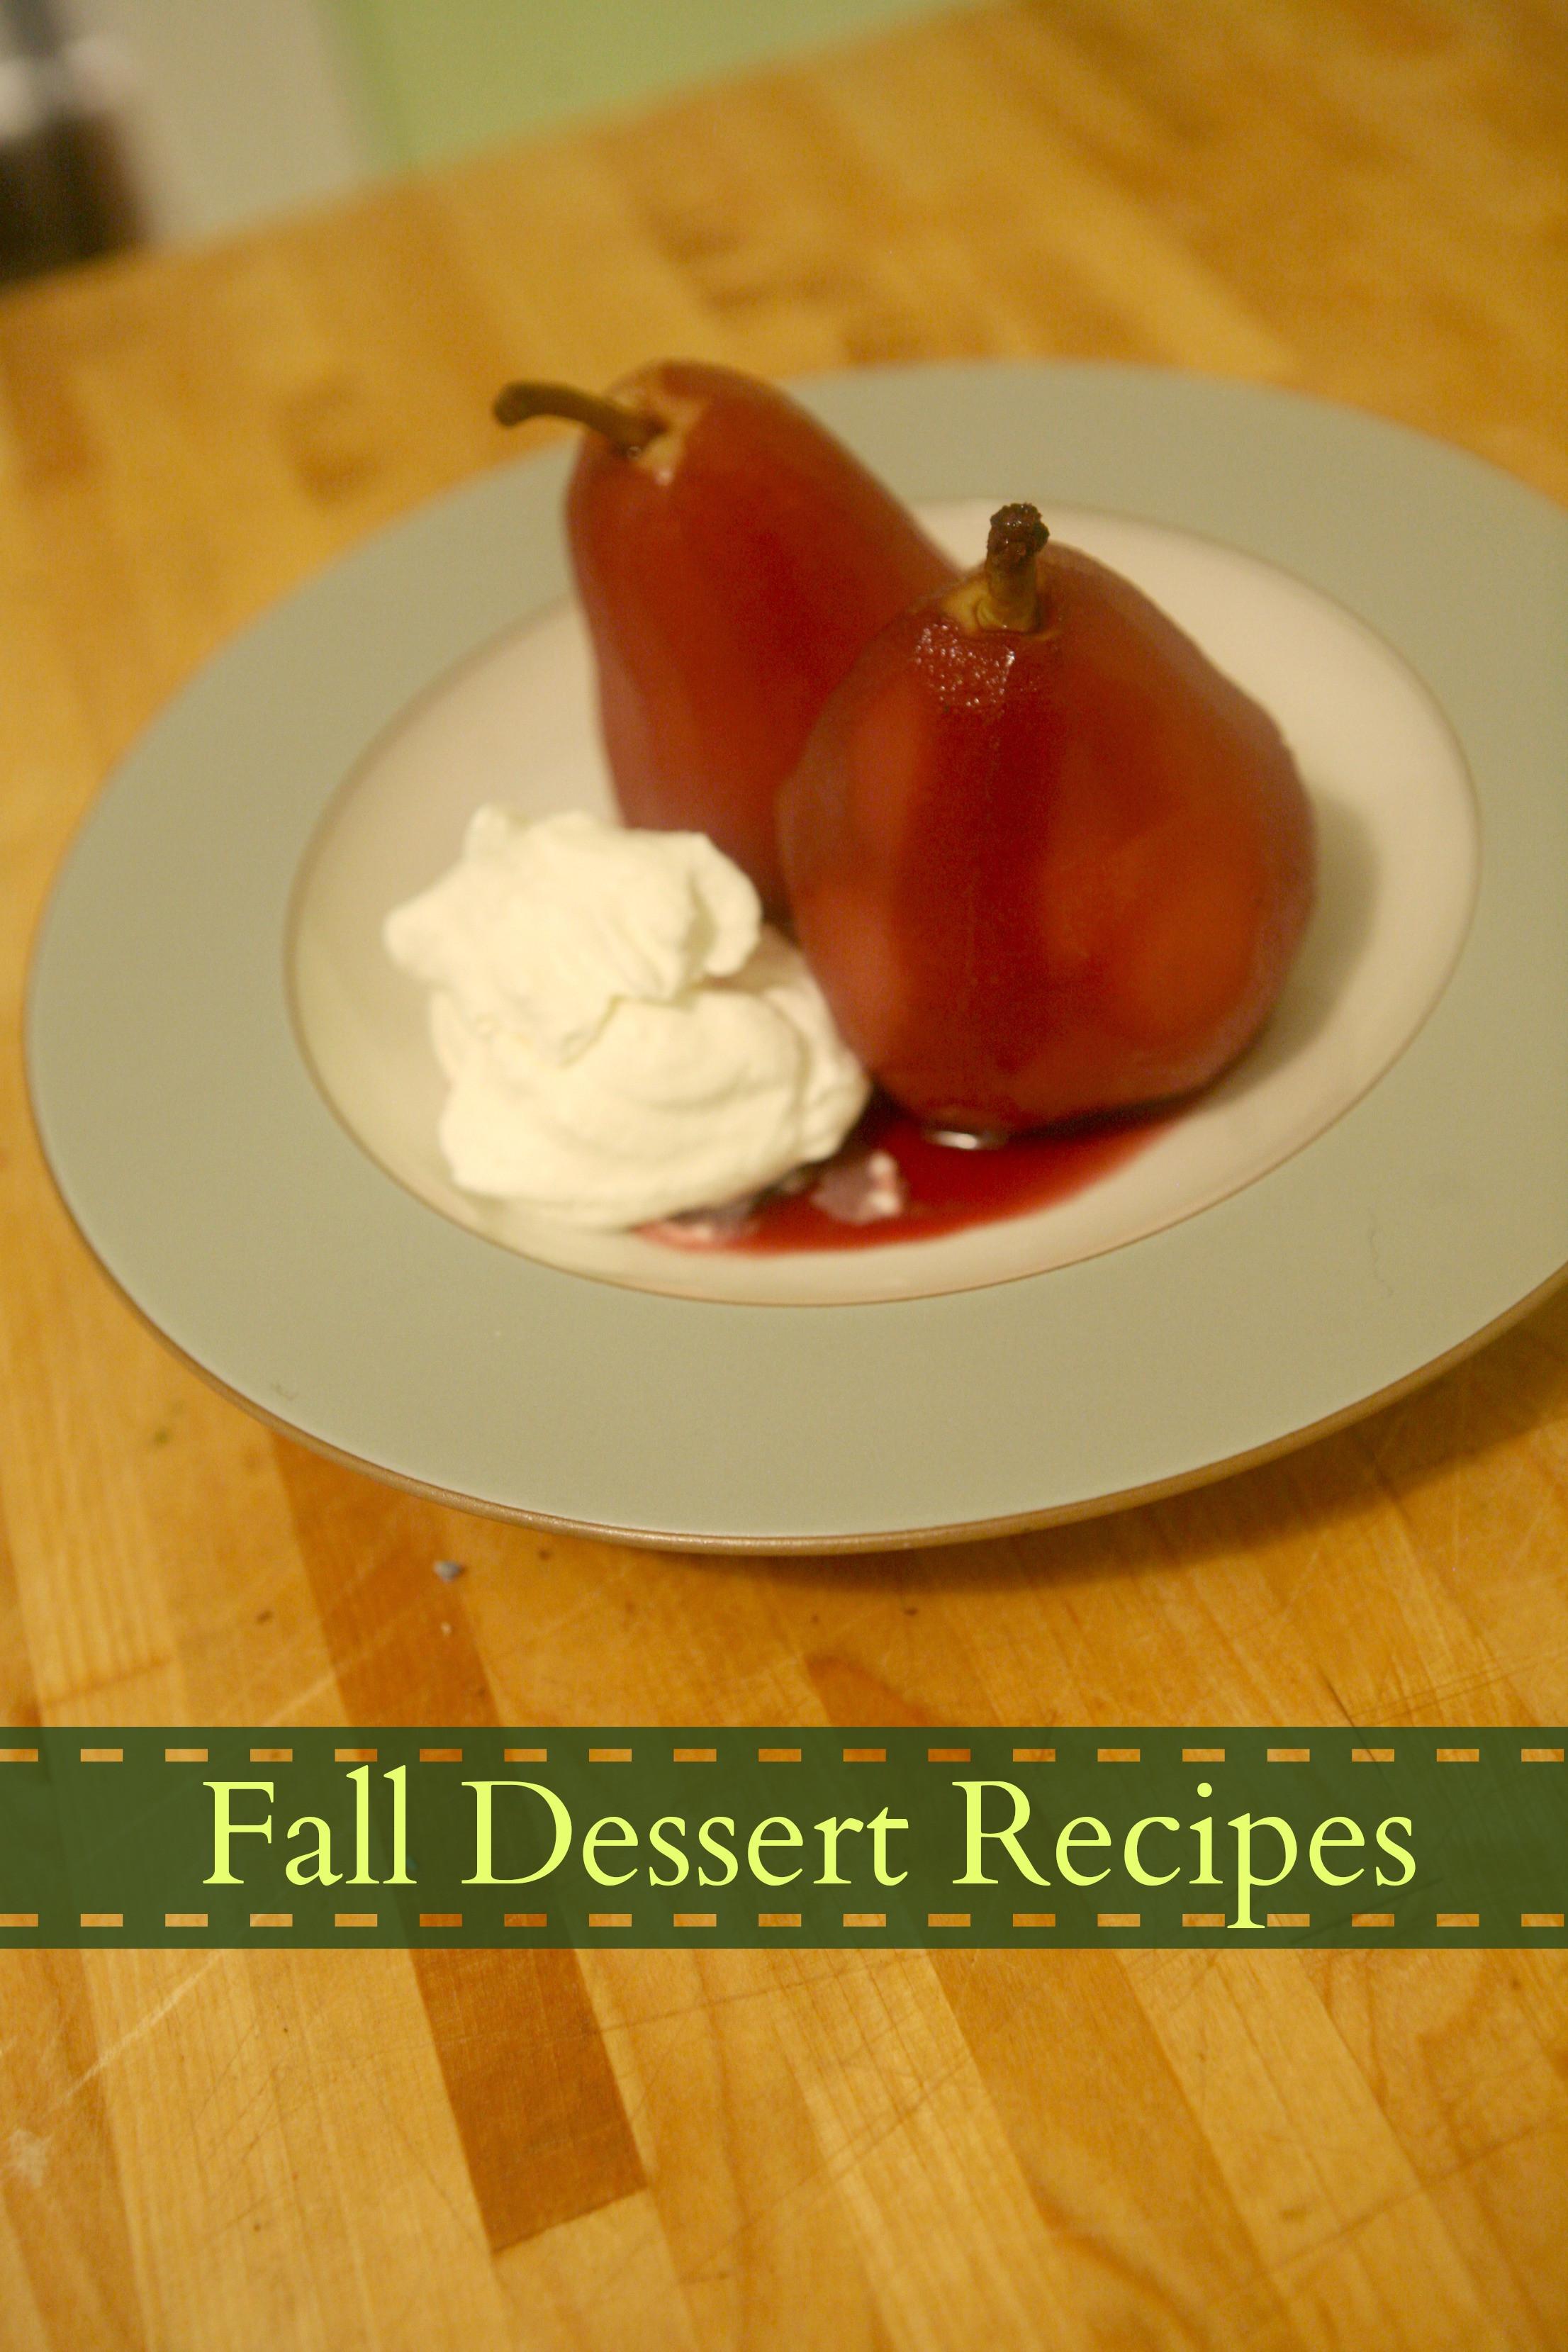 Fall Desserts Recipe  Fall Dessert Recipes Pears poached in red wine Gluten